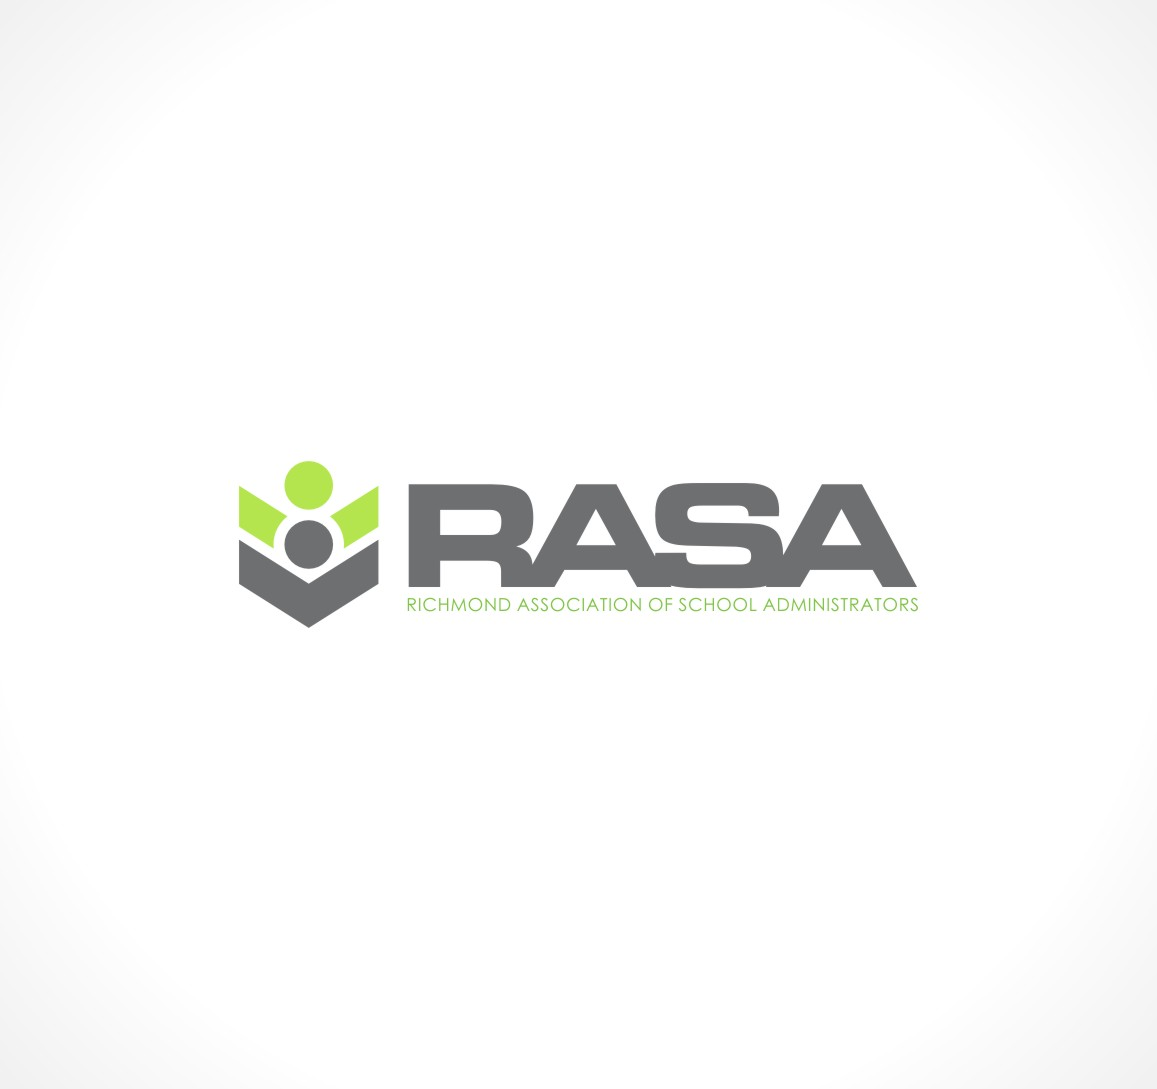 Logo Design by Private User - Entry No. 75 in the Logo Design Contest New Logo Design for RASA - Richmond Association of School Administrato.